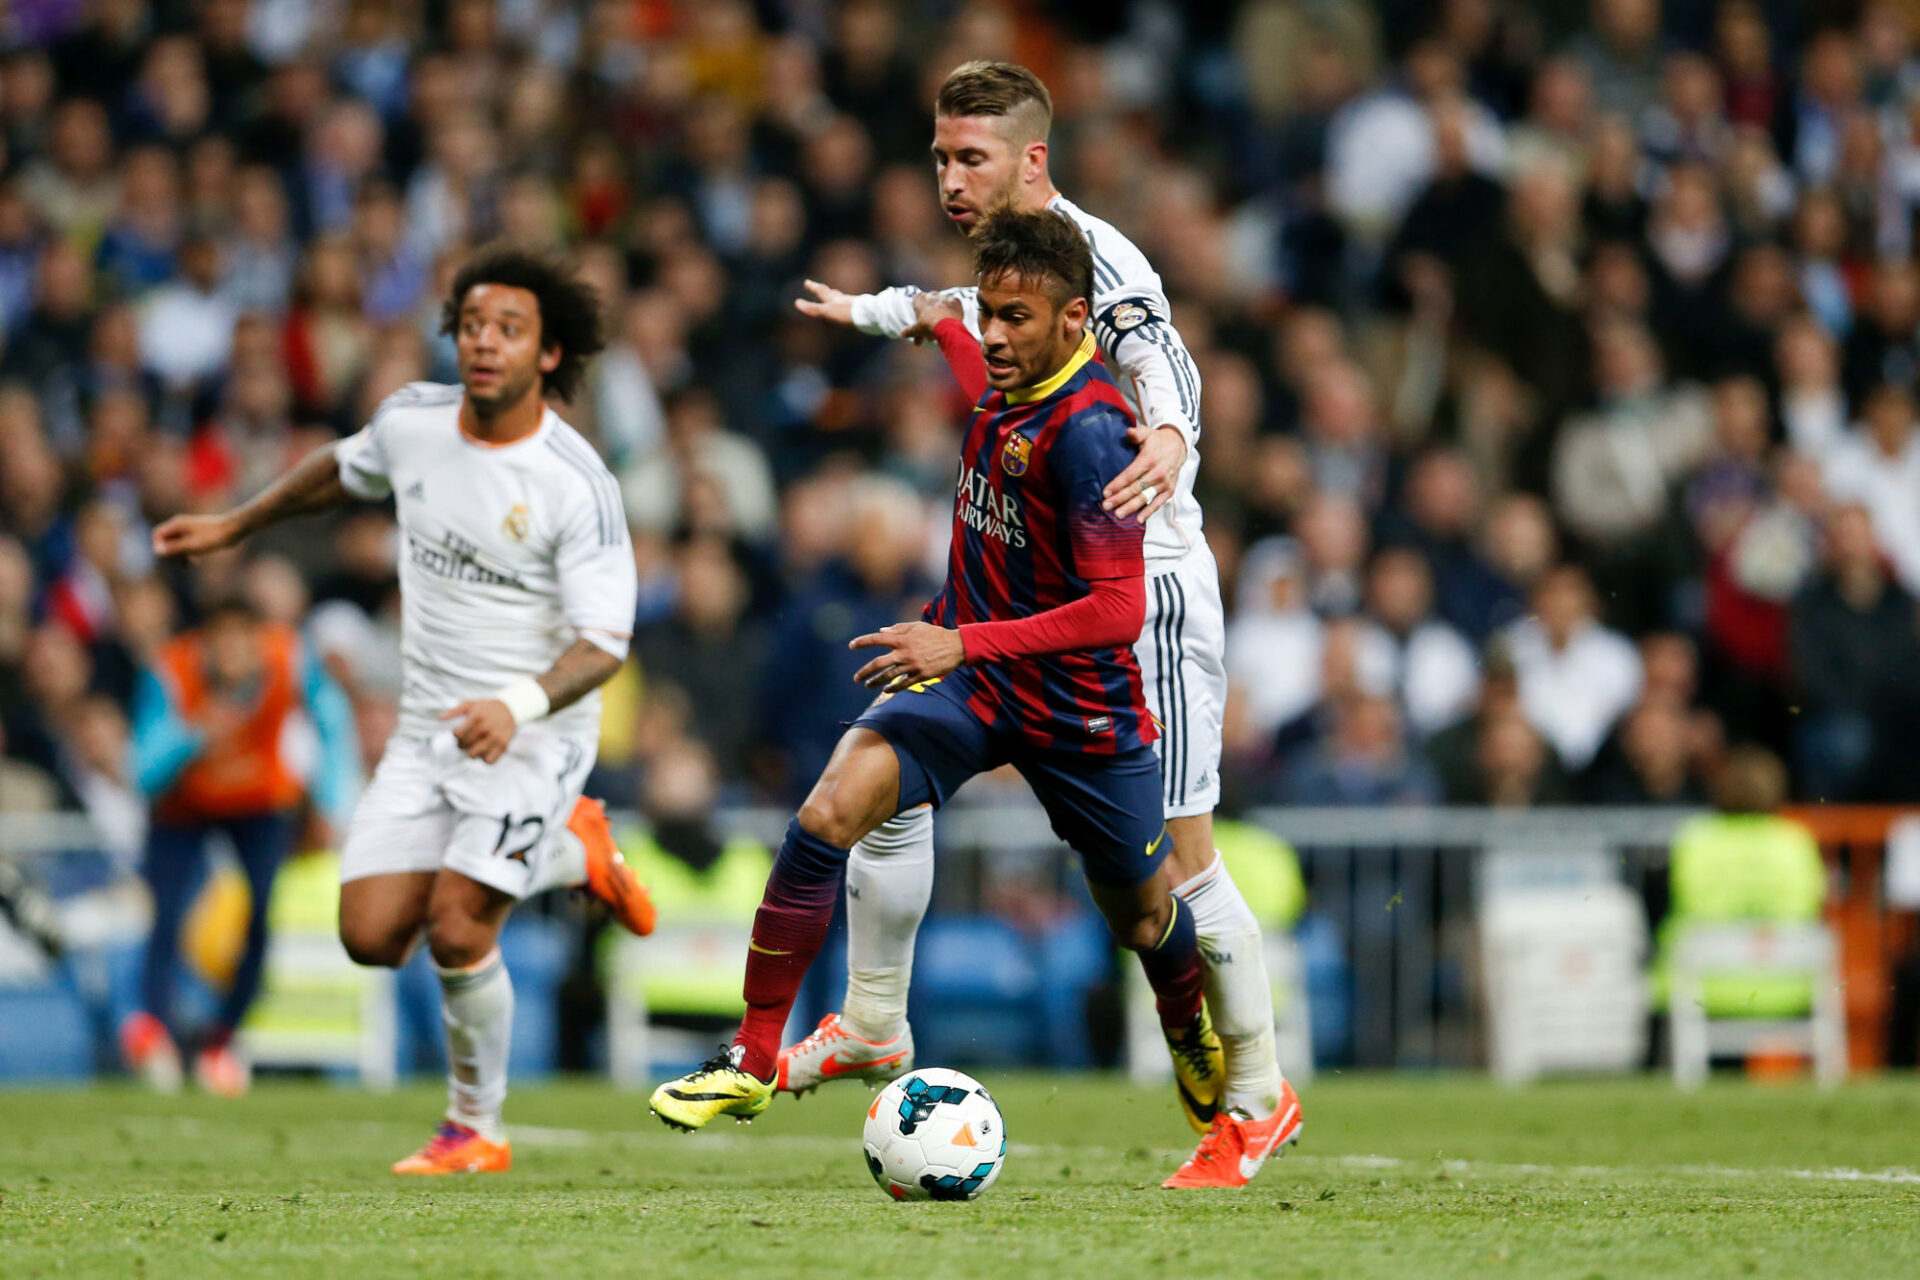 Sergio Ramos et Neymar, des adversaires devenus amis